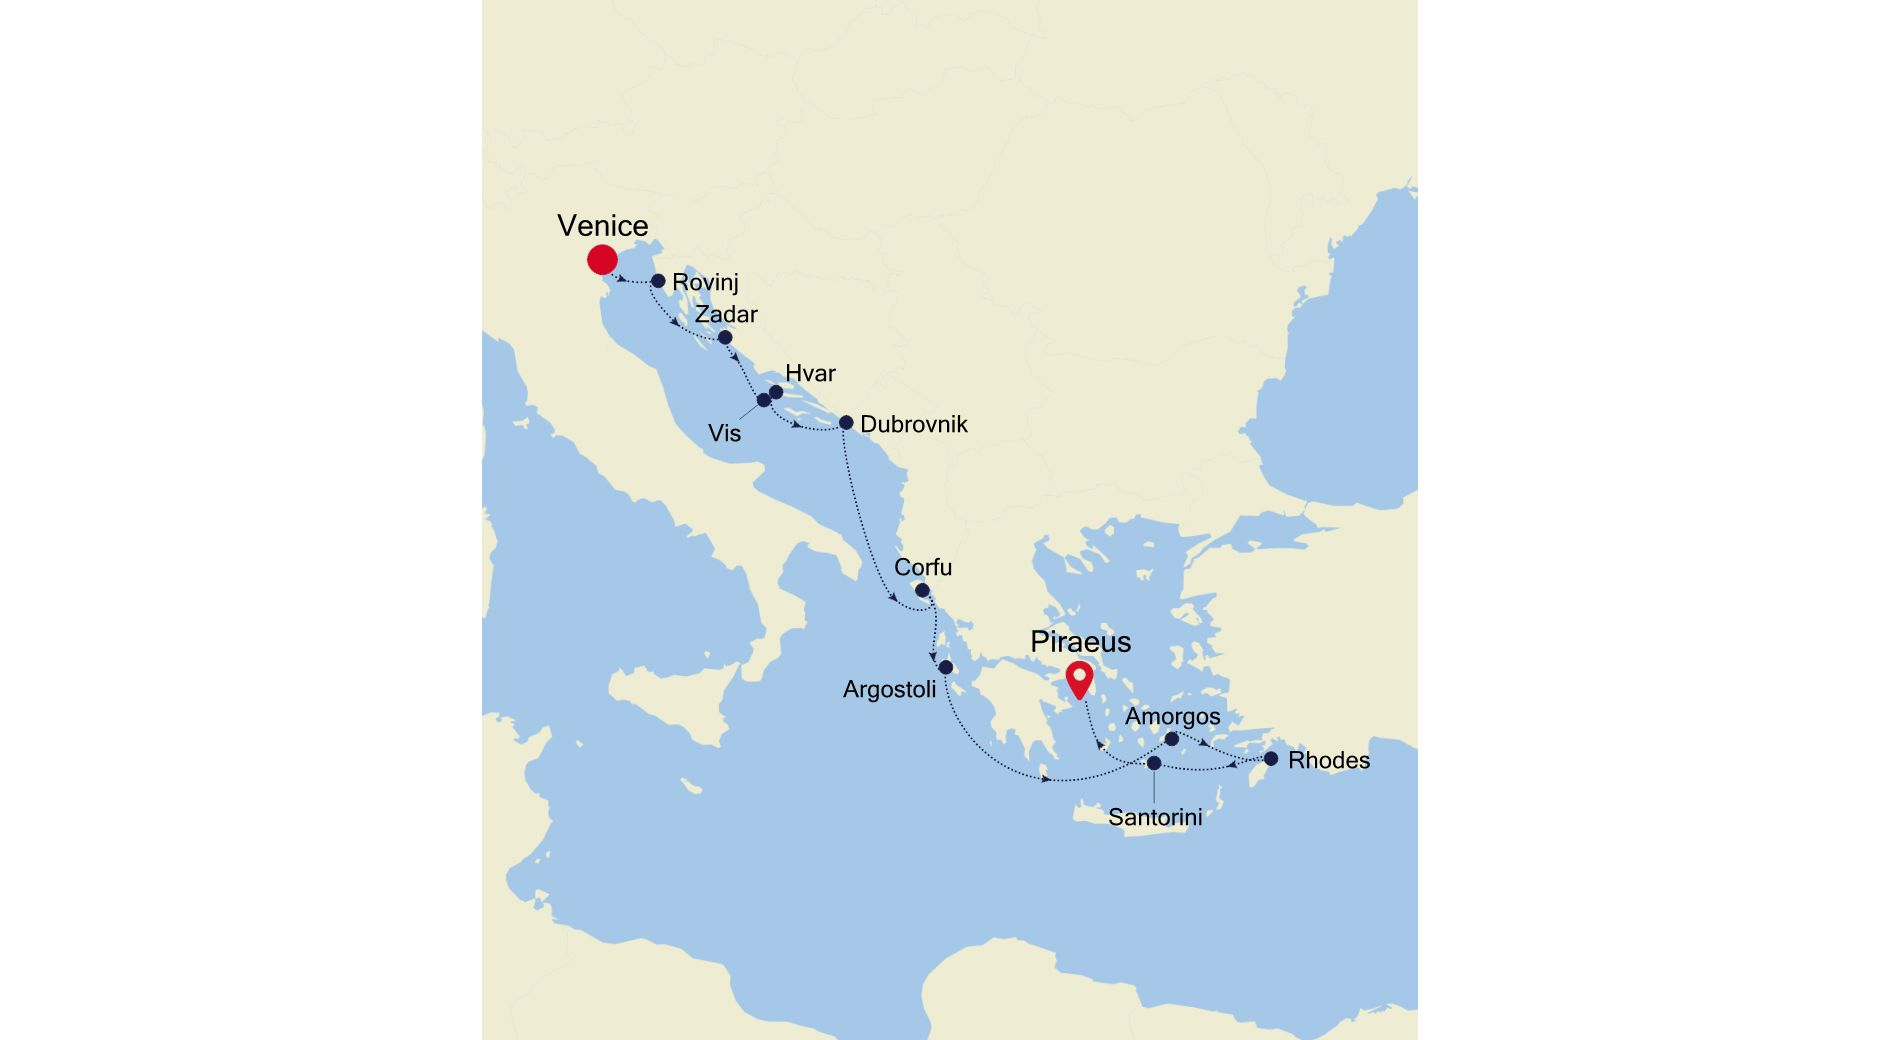 SS210806010 - Venice a Piraeus